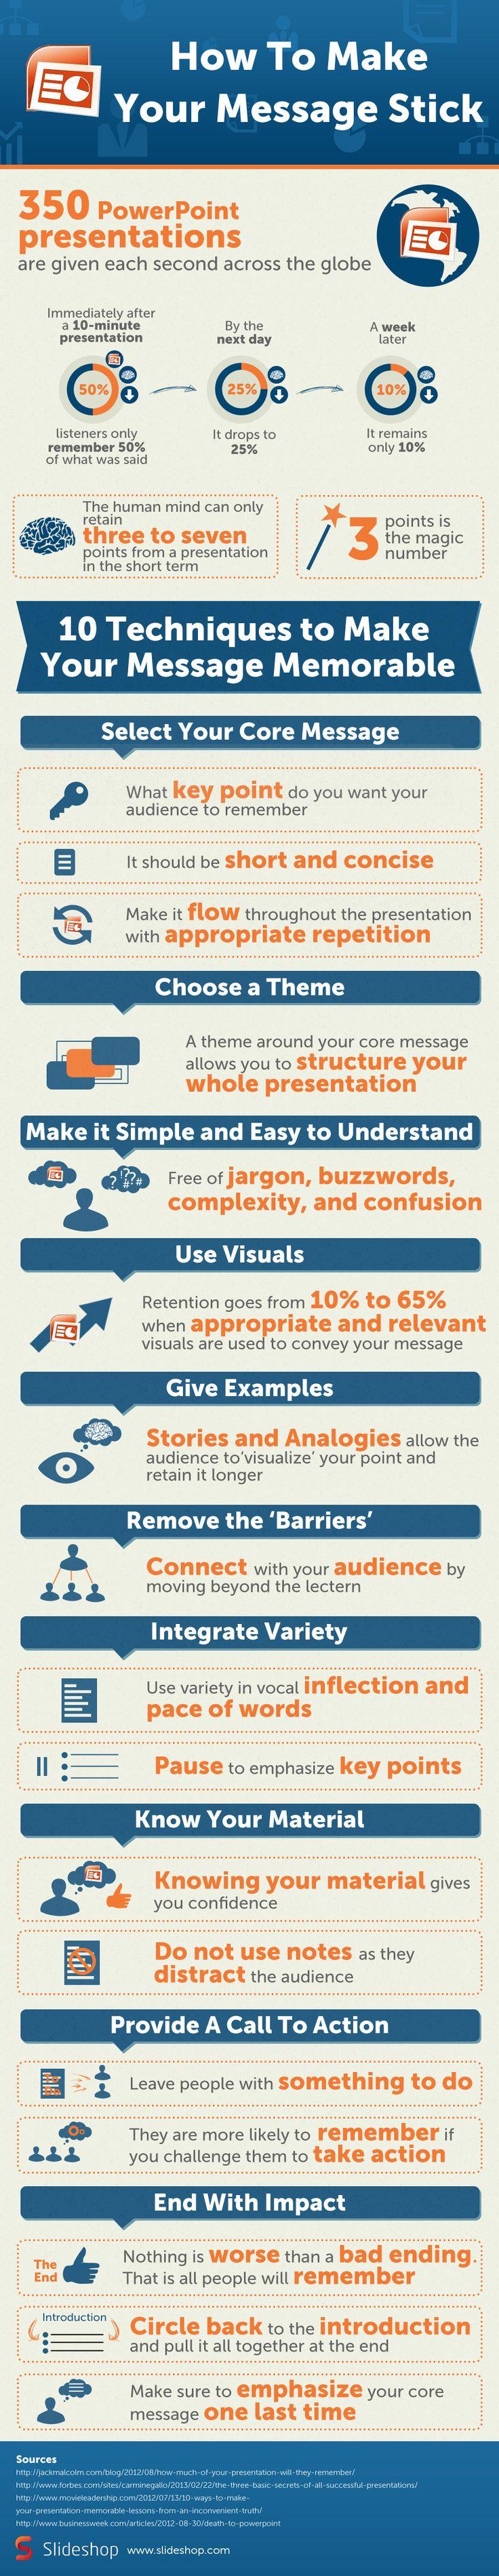 Published by: Slideshop TIPS FOR: presentation tips, powerpoint presentation